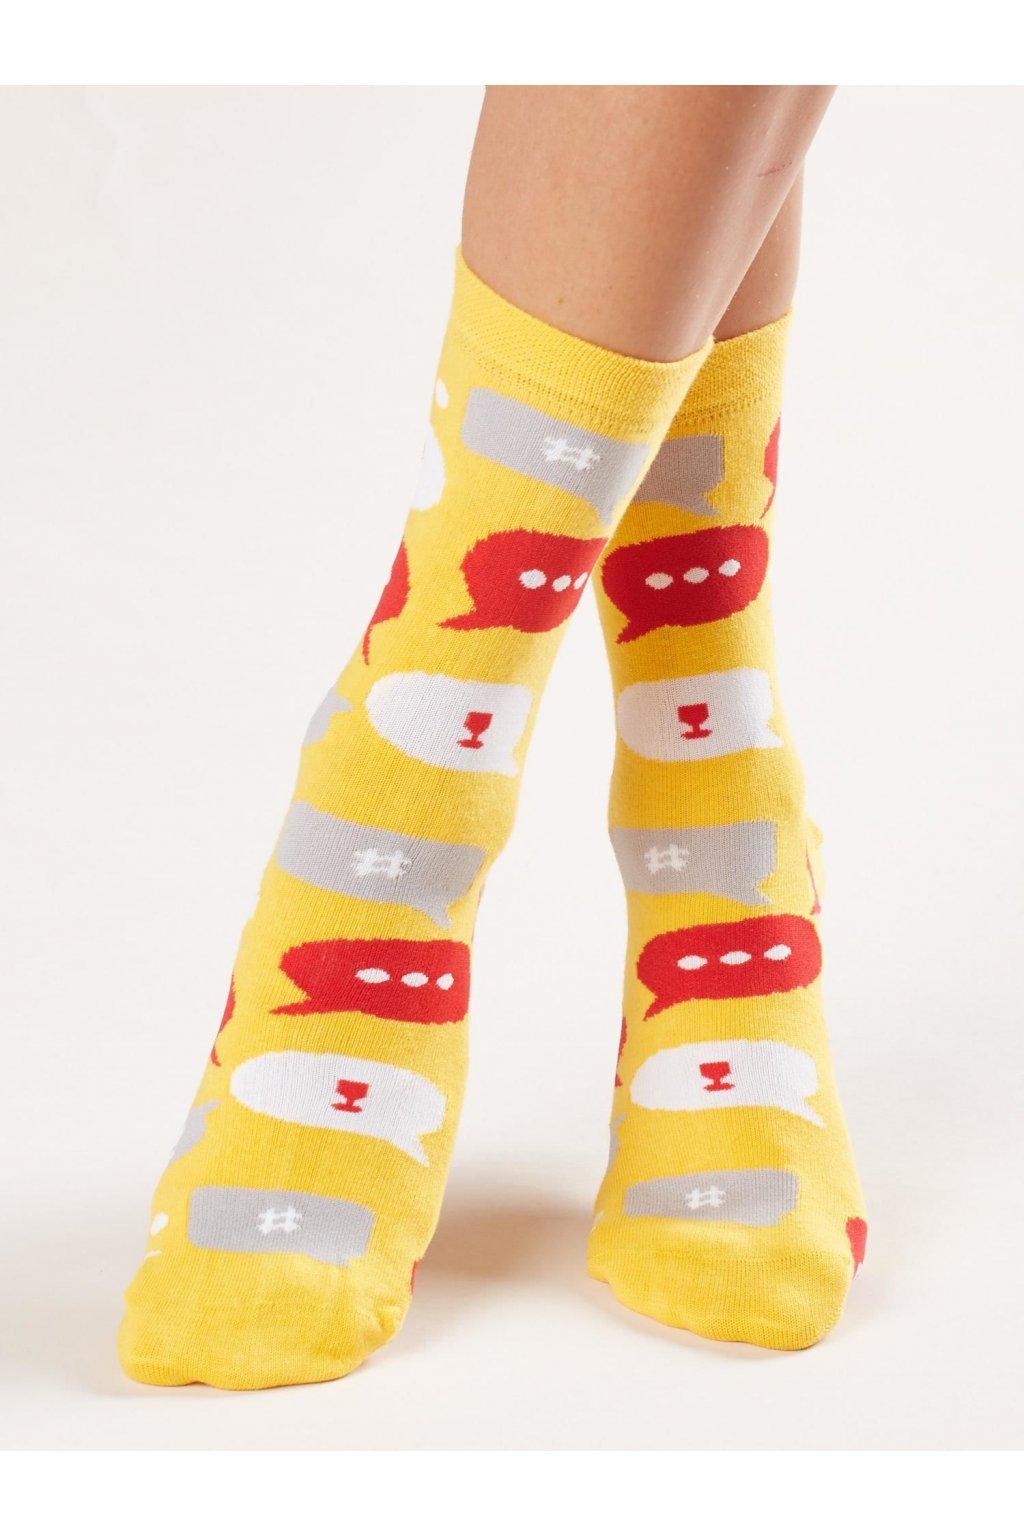 Dámske ponožky kód WS-SR-5396.36